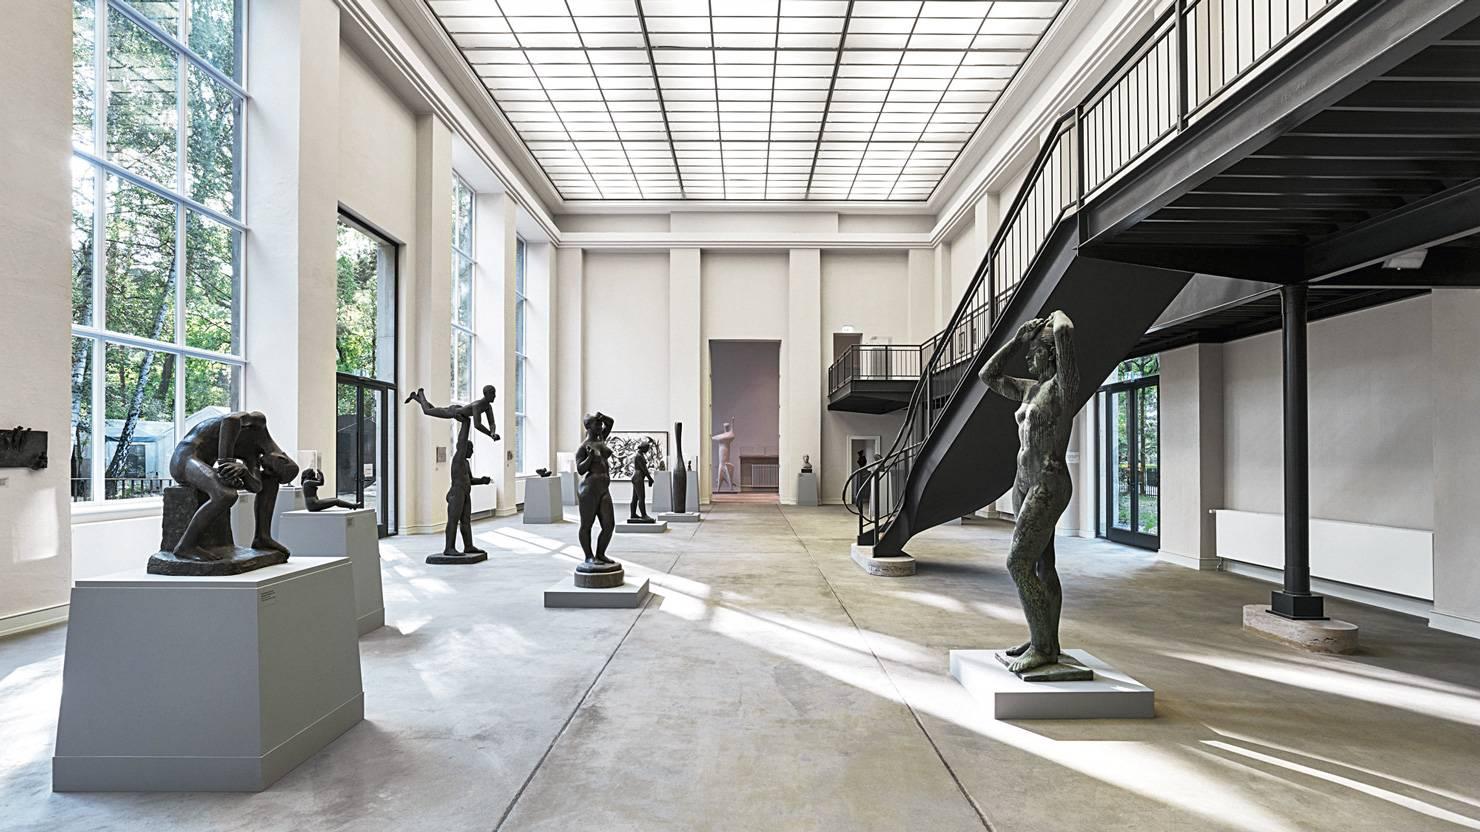 serramenti-acciaio-zincato-kunsthaus-dahlem-petra-e-paul-kahlfeldt-3_project_big